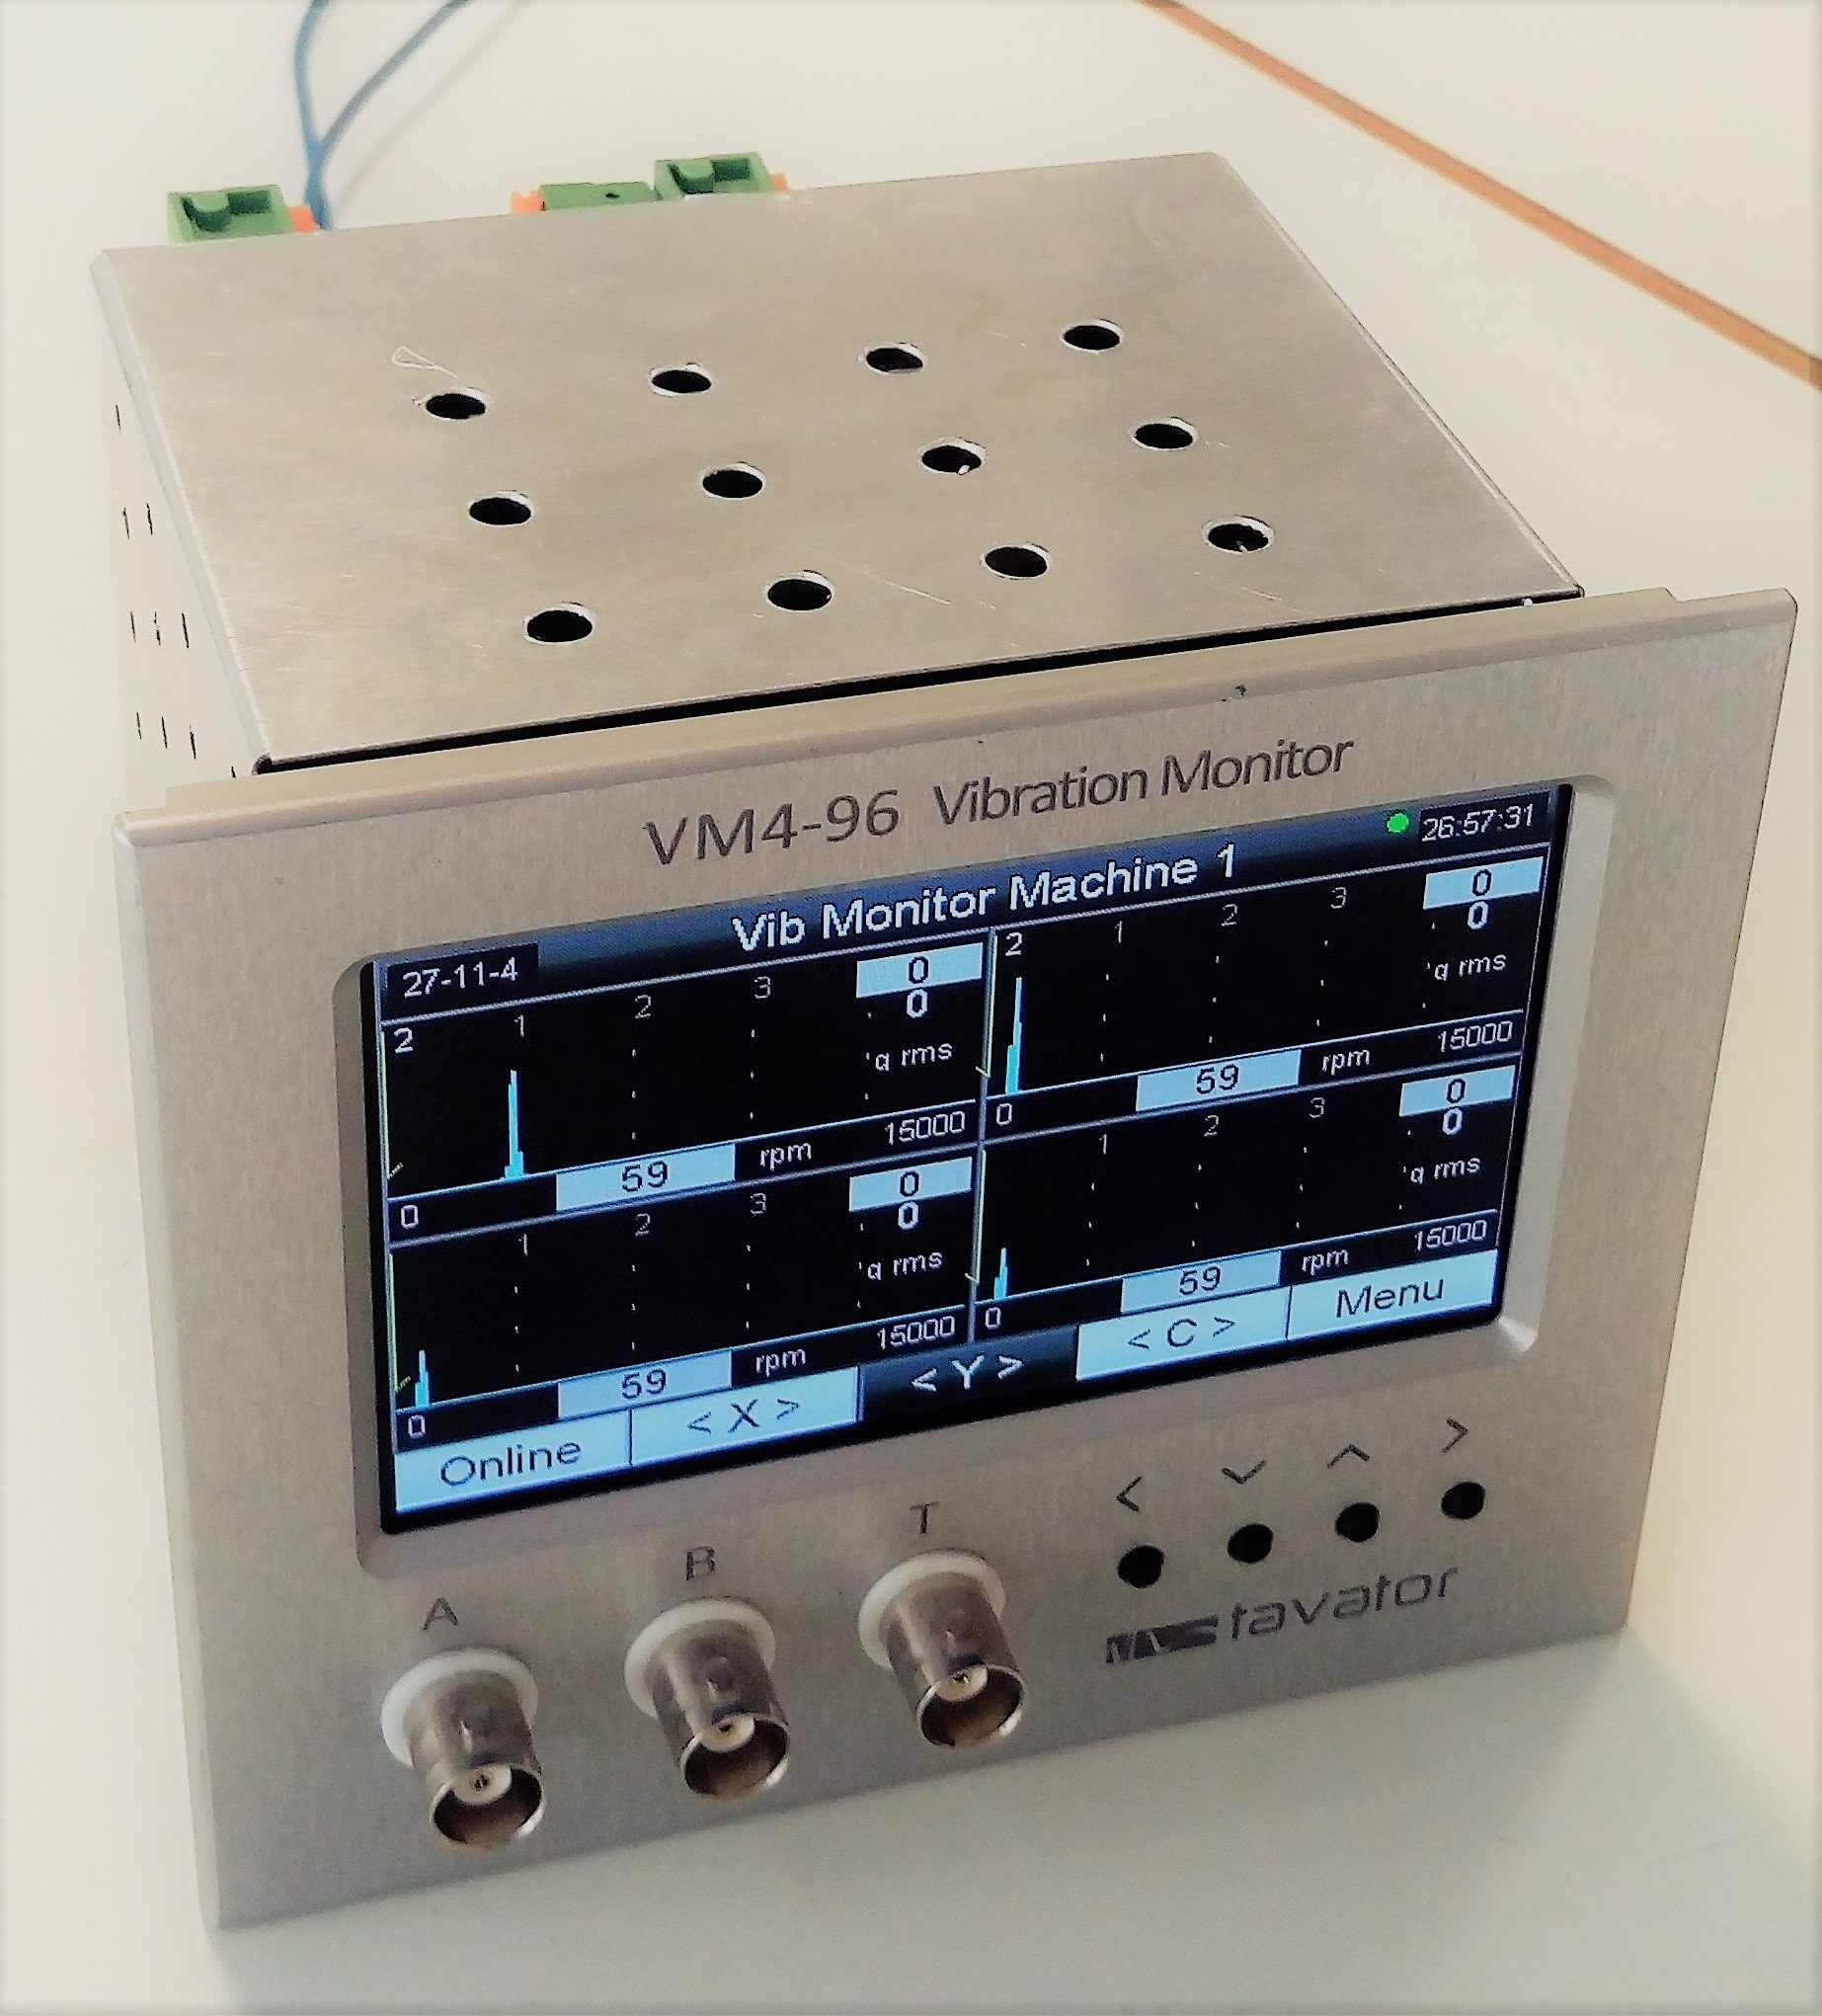 vm4-96